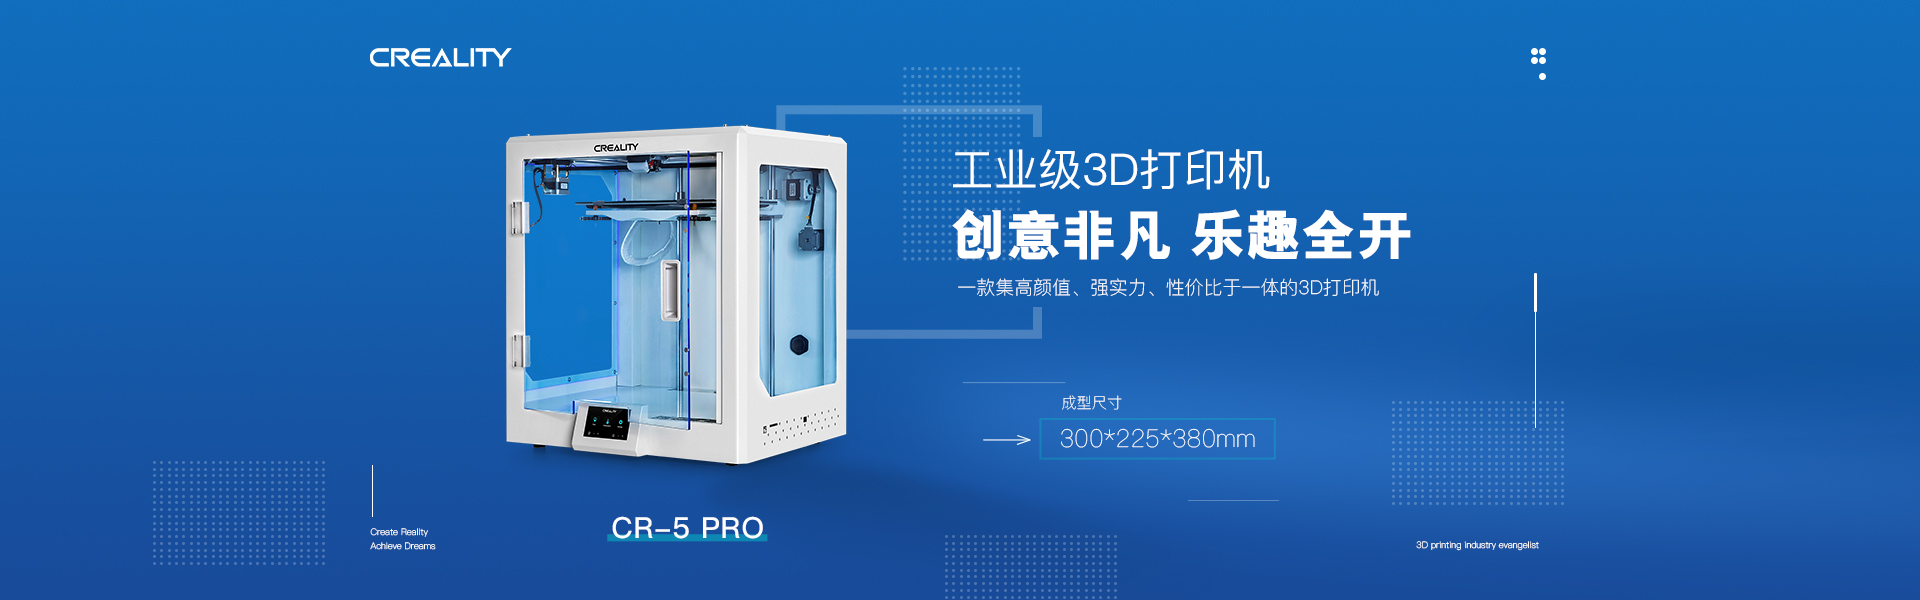 CR-6 SE 超级打印机 为创意而生